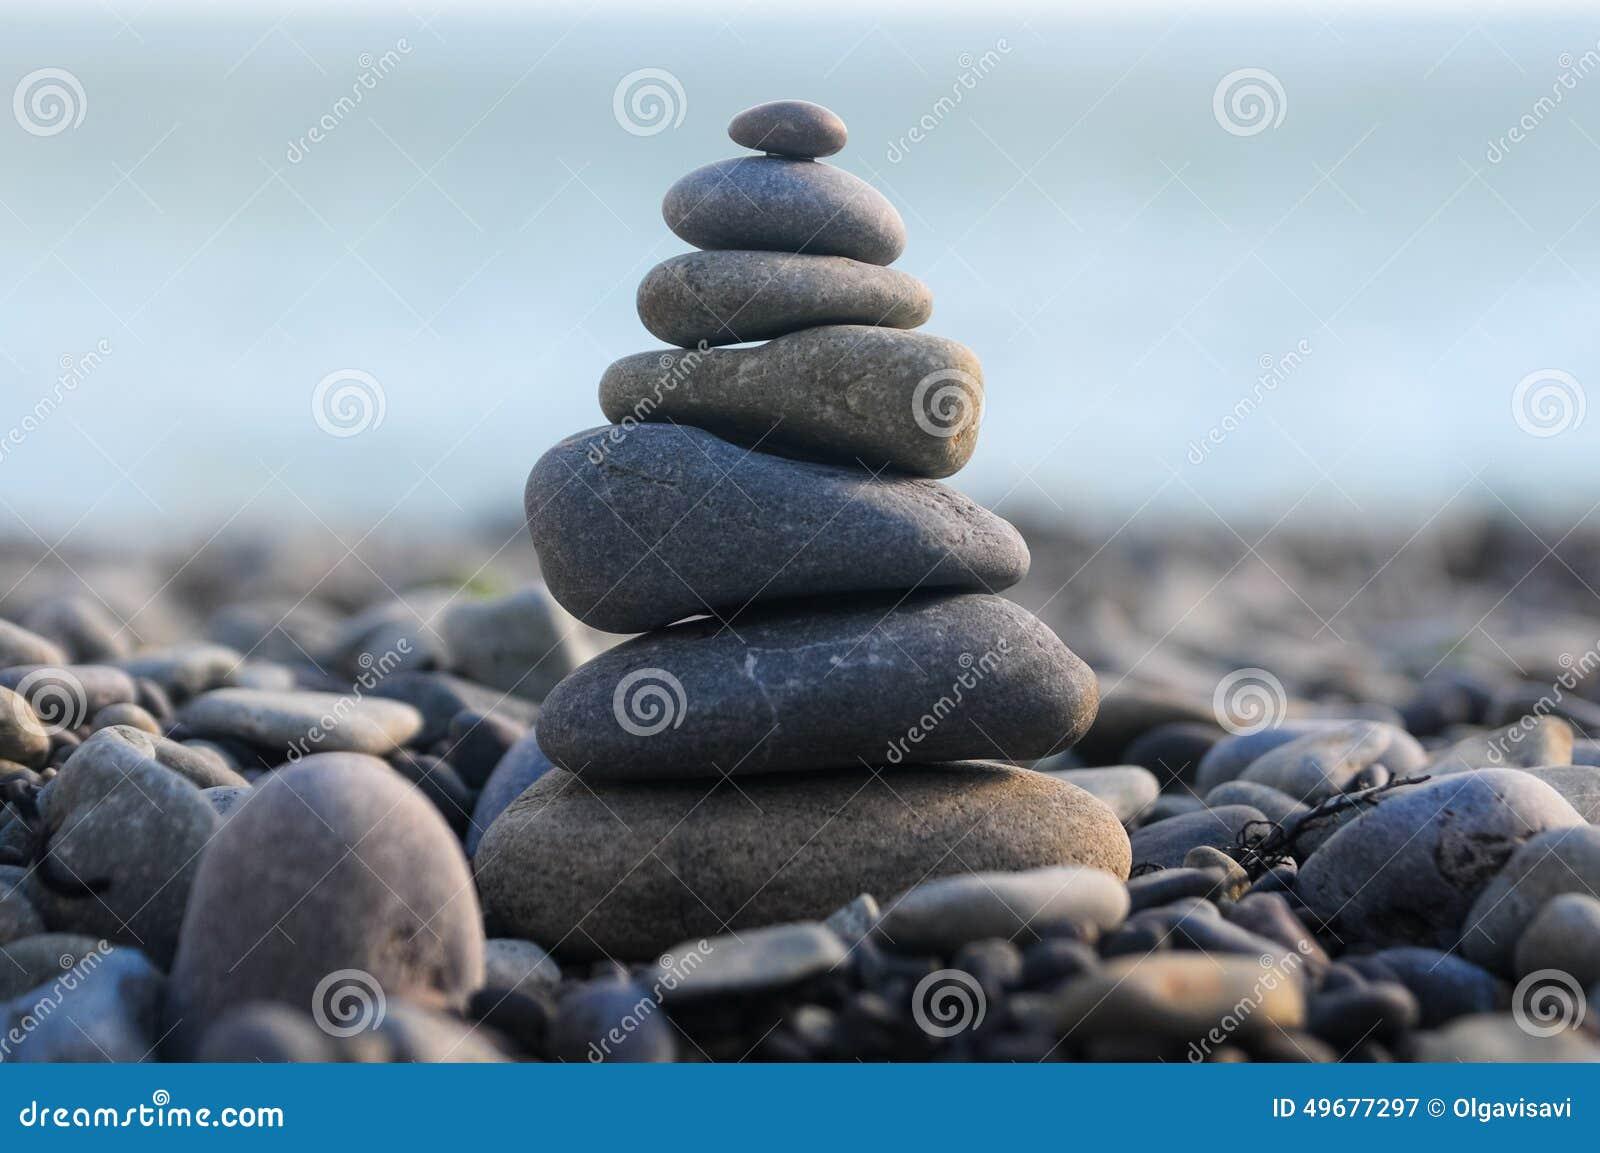 Pyramid of pebble stones